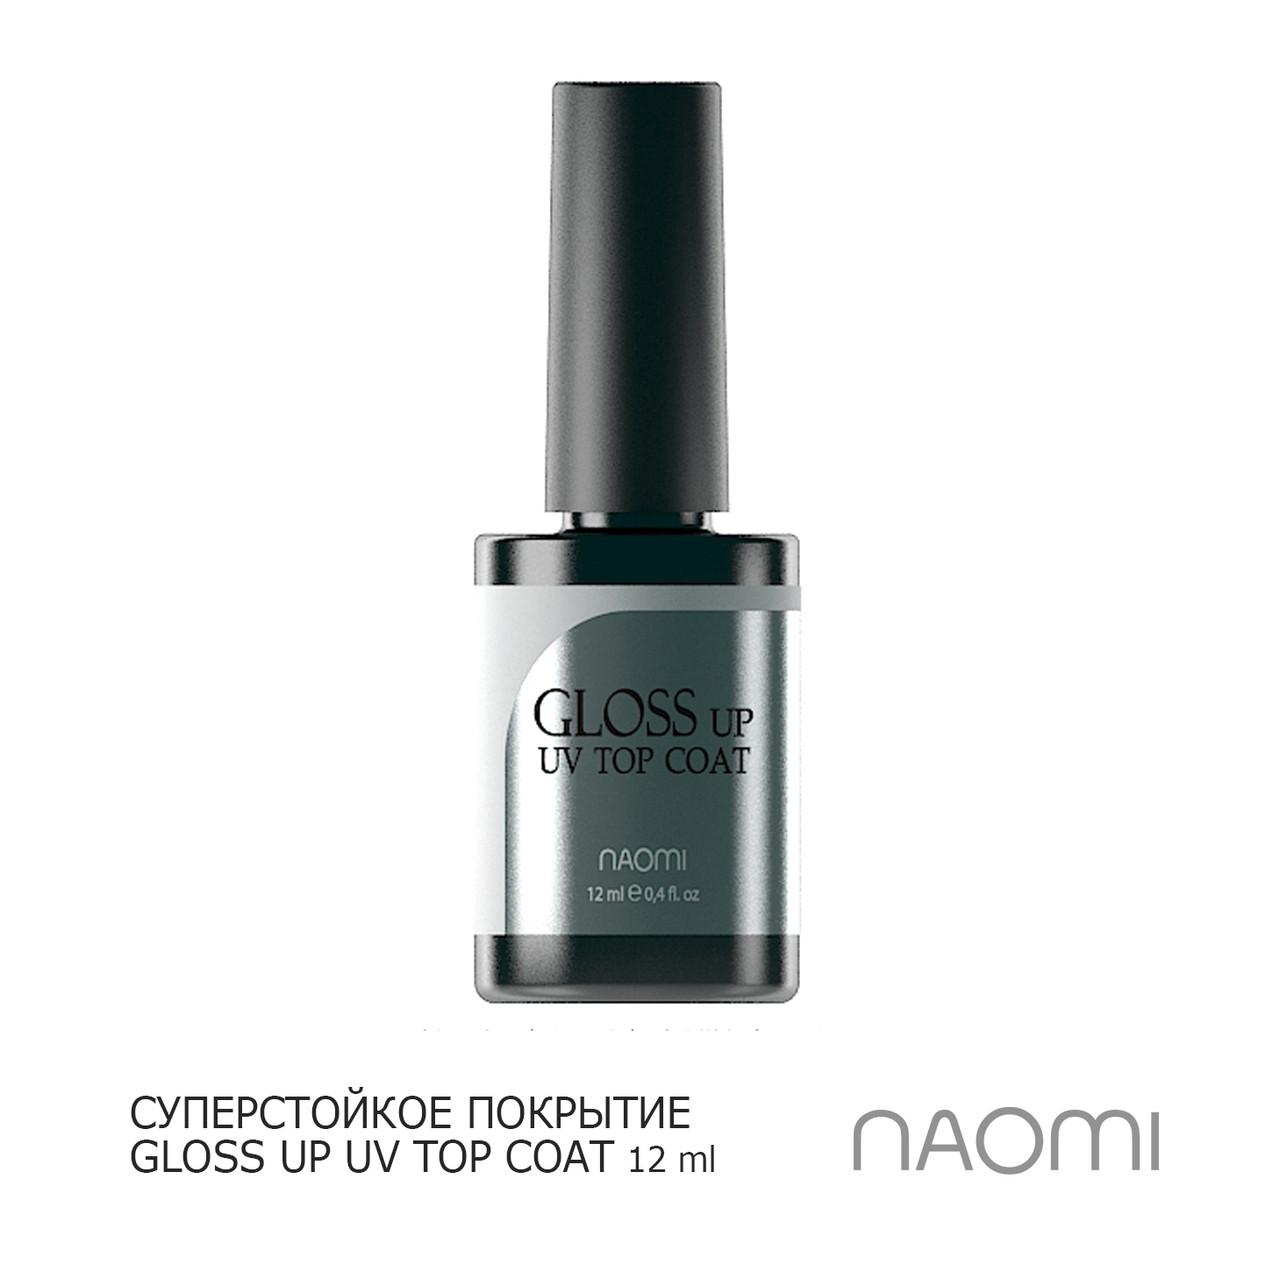 Топ для гель-лака глянцевый Naomi Gloss Up UV Top Coat, 6 мл